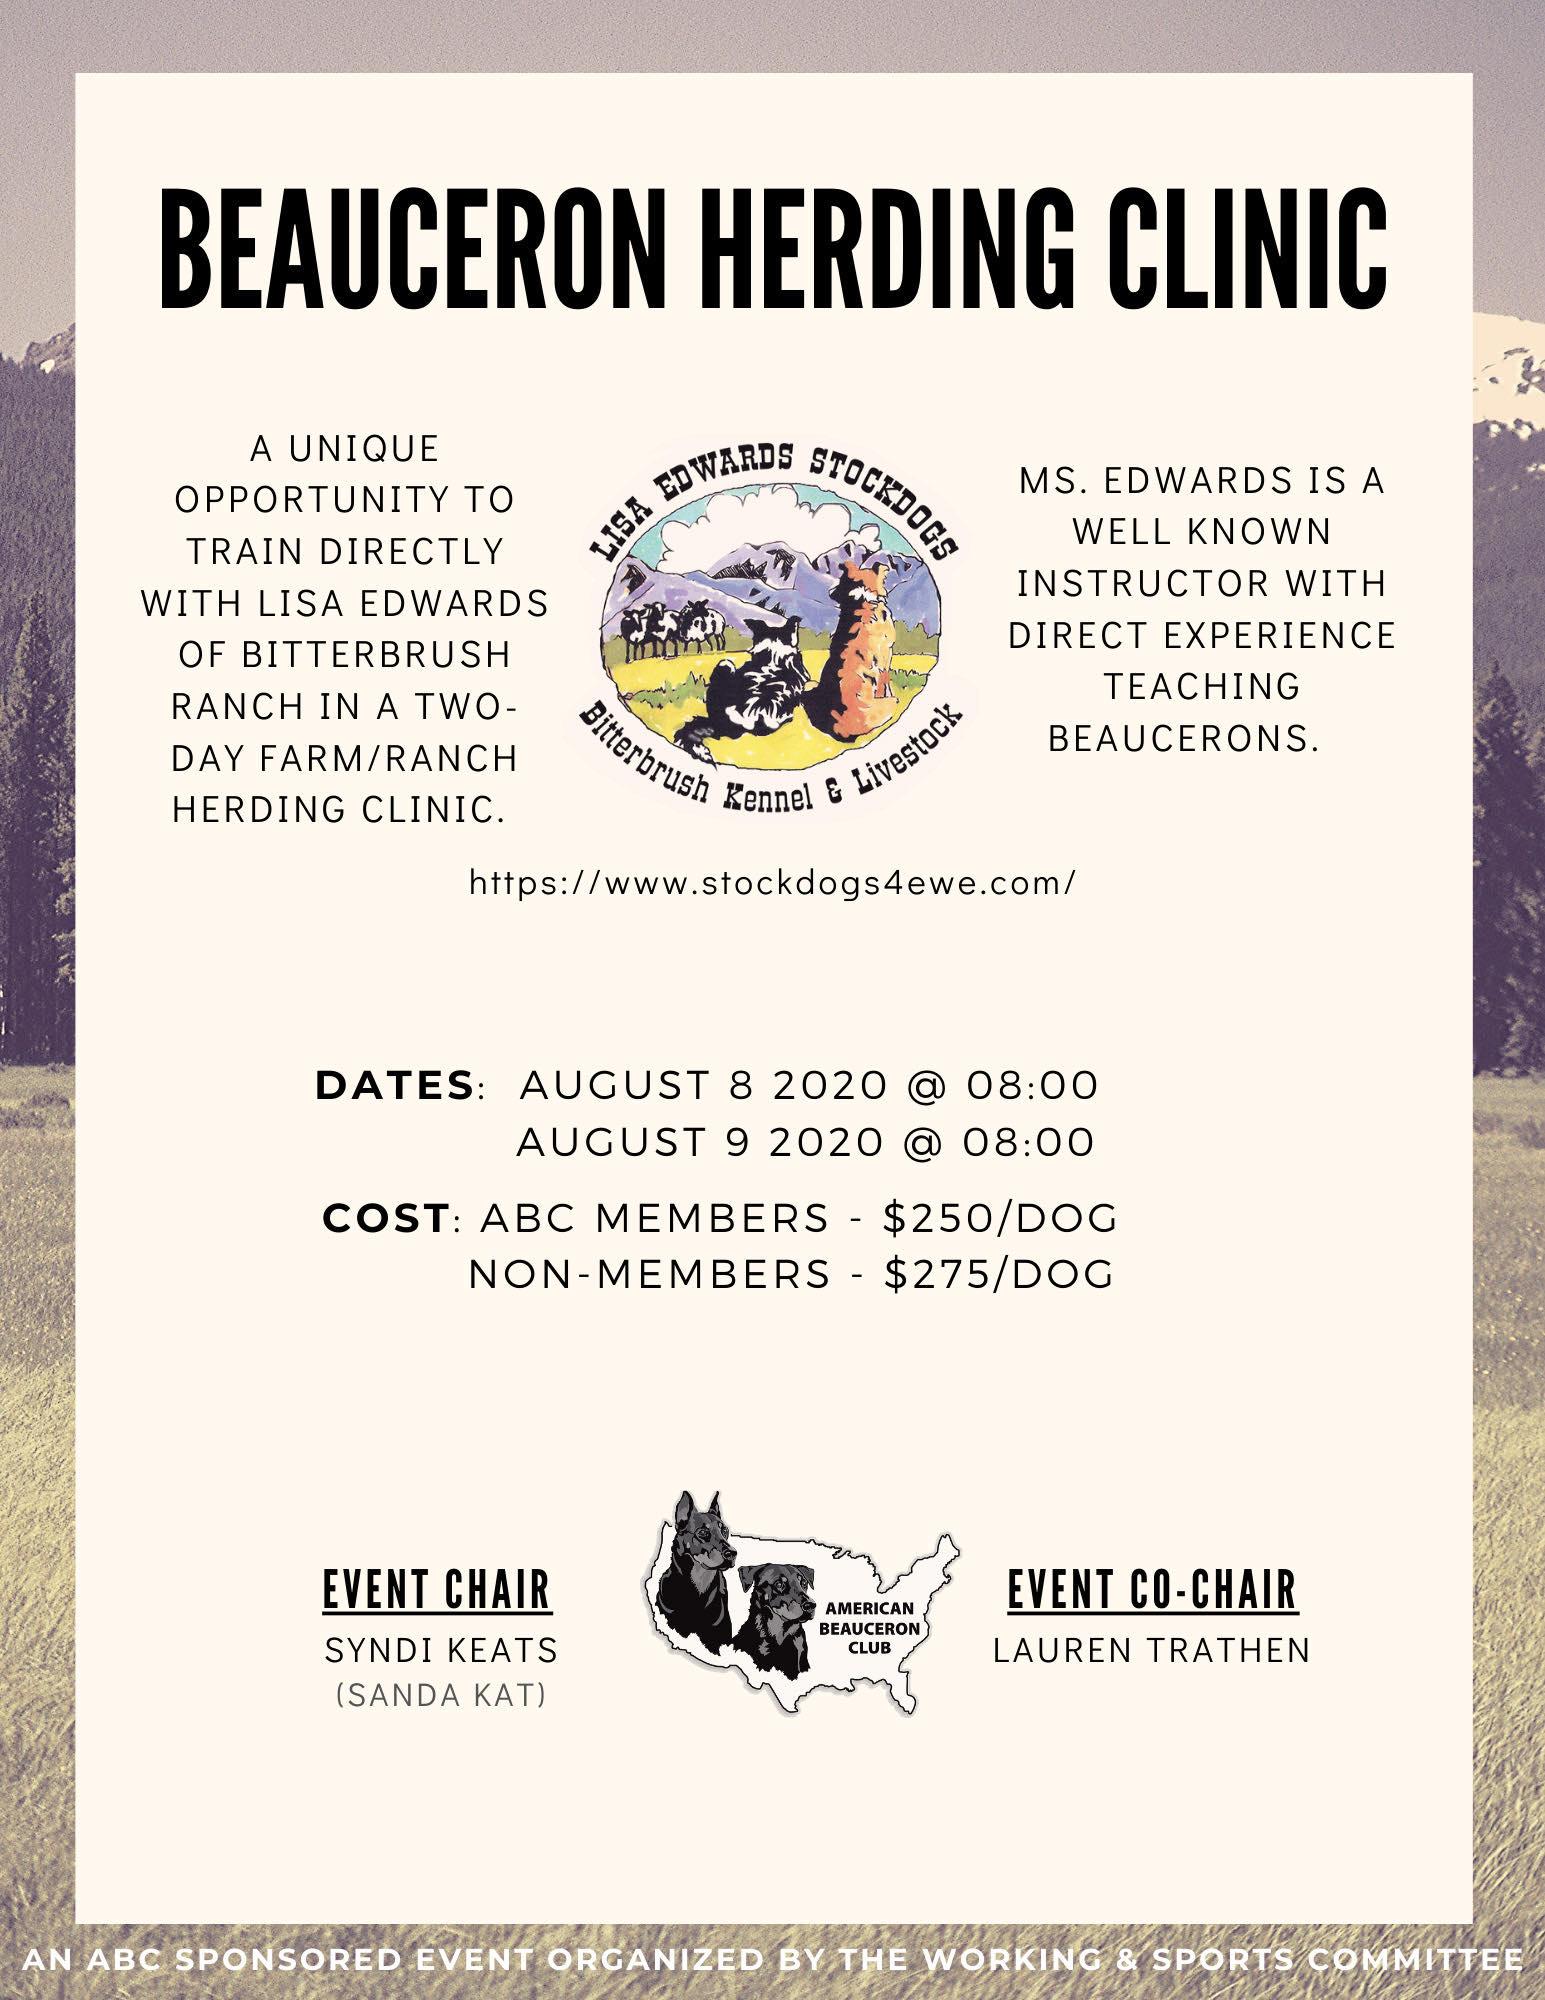 Beauceron Herding Clinic August 2020